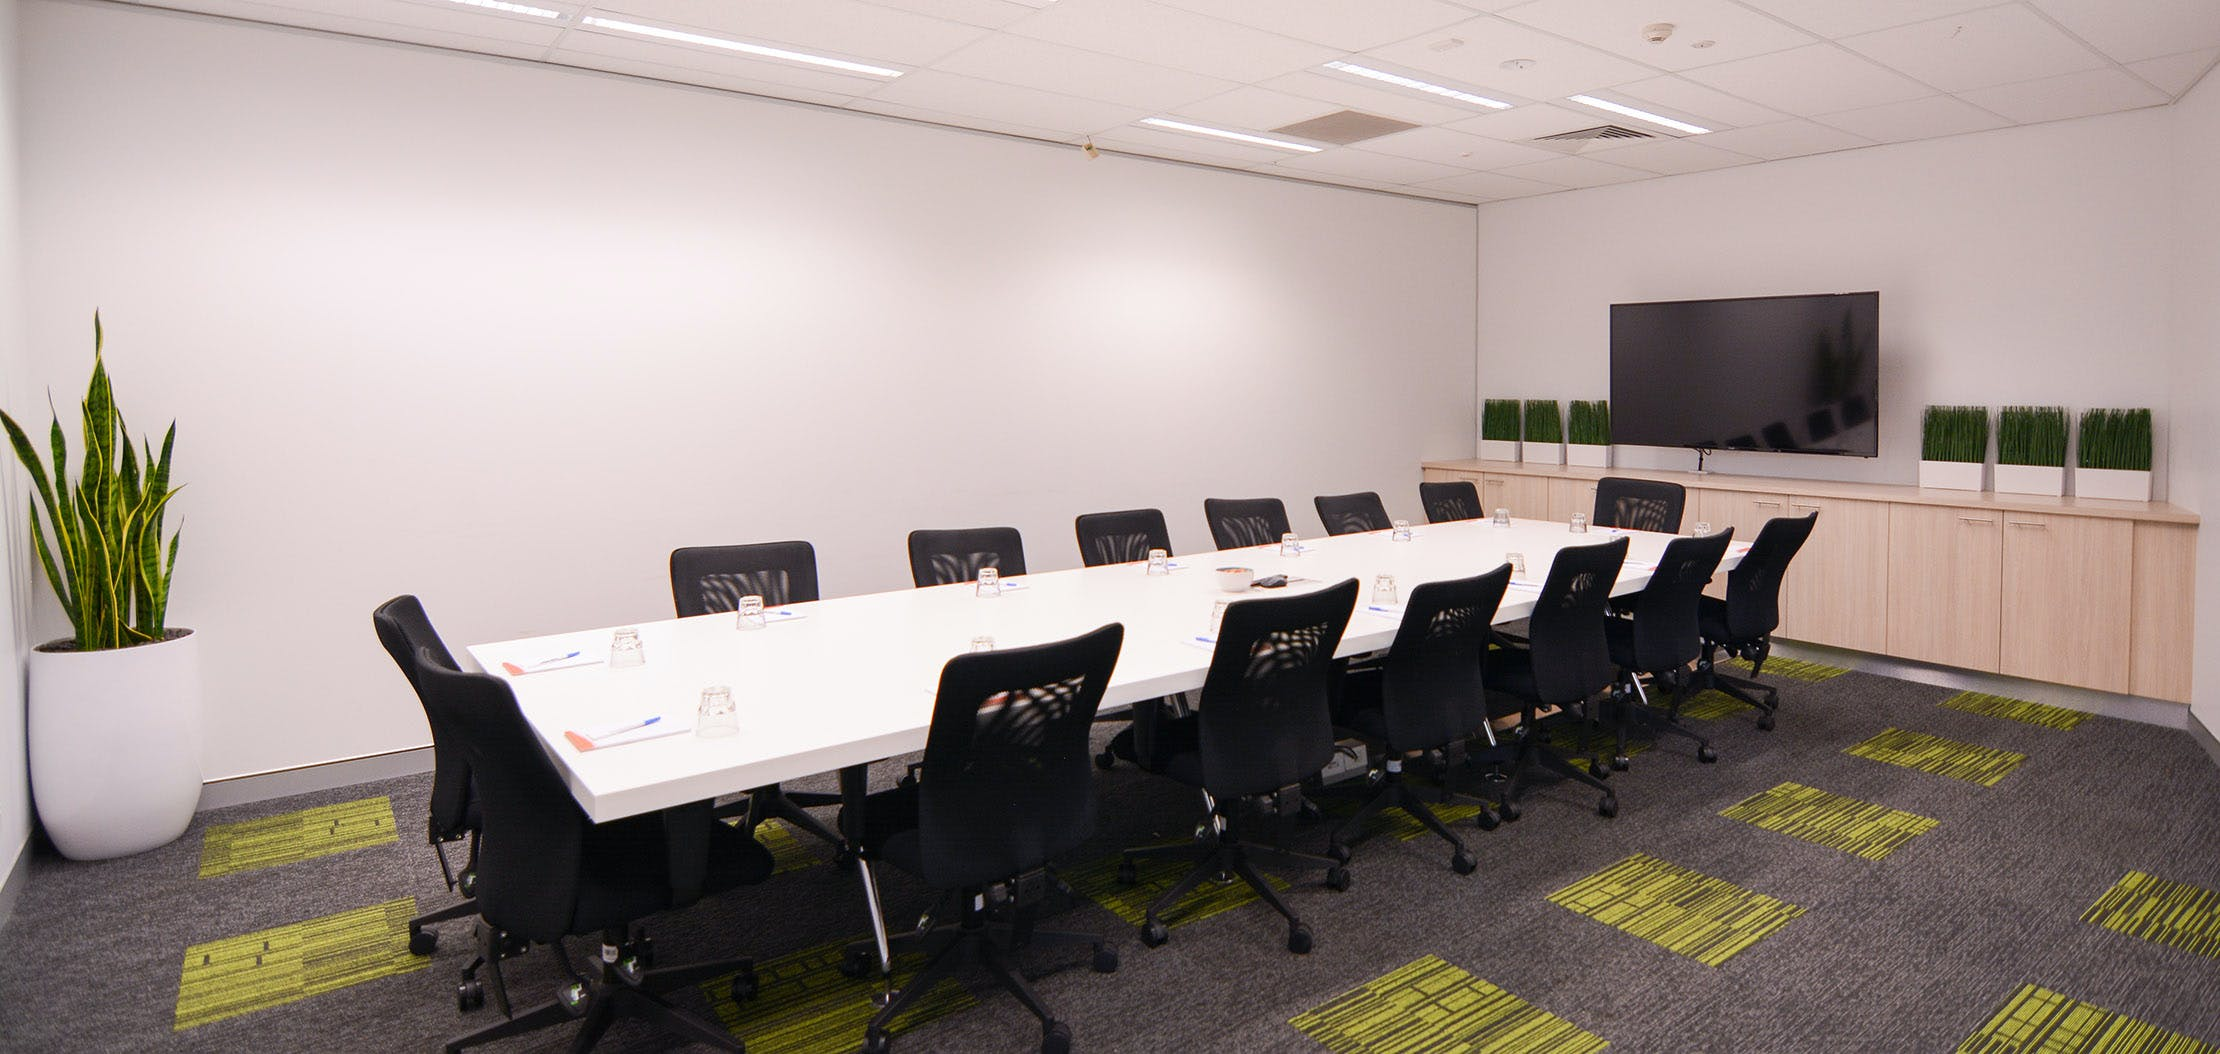 Boardroom, meeting room at BTP One, image 1